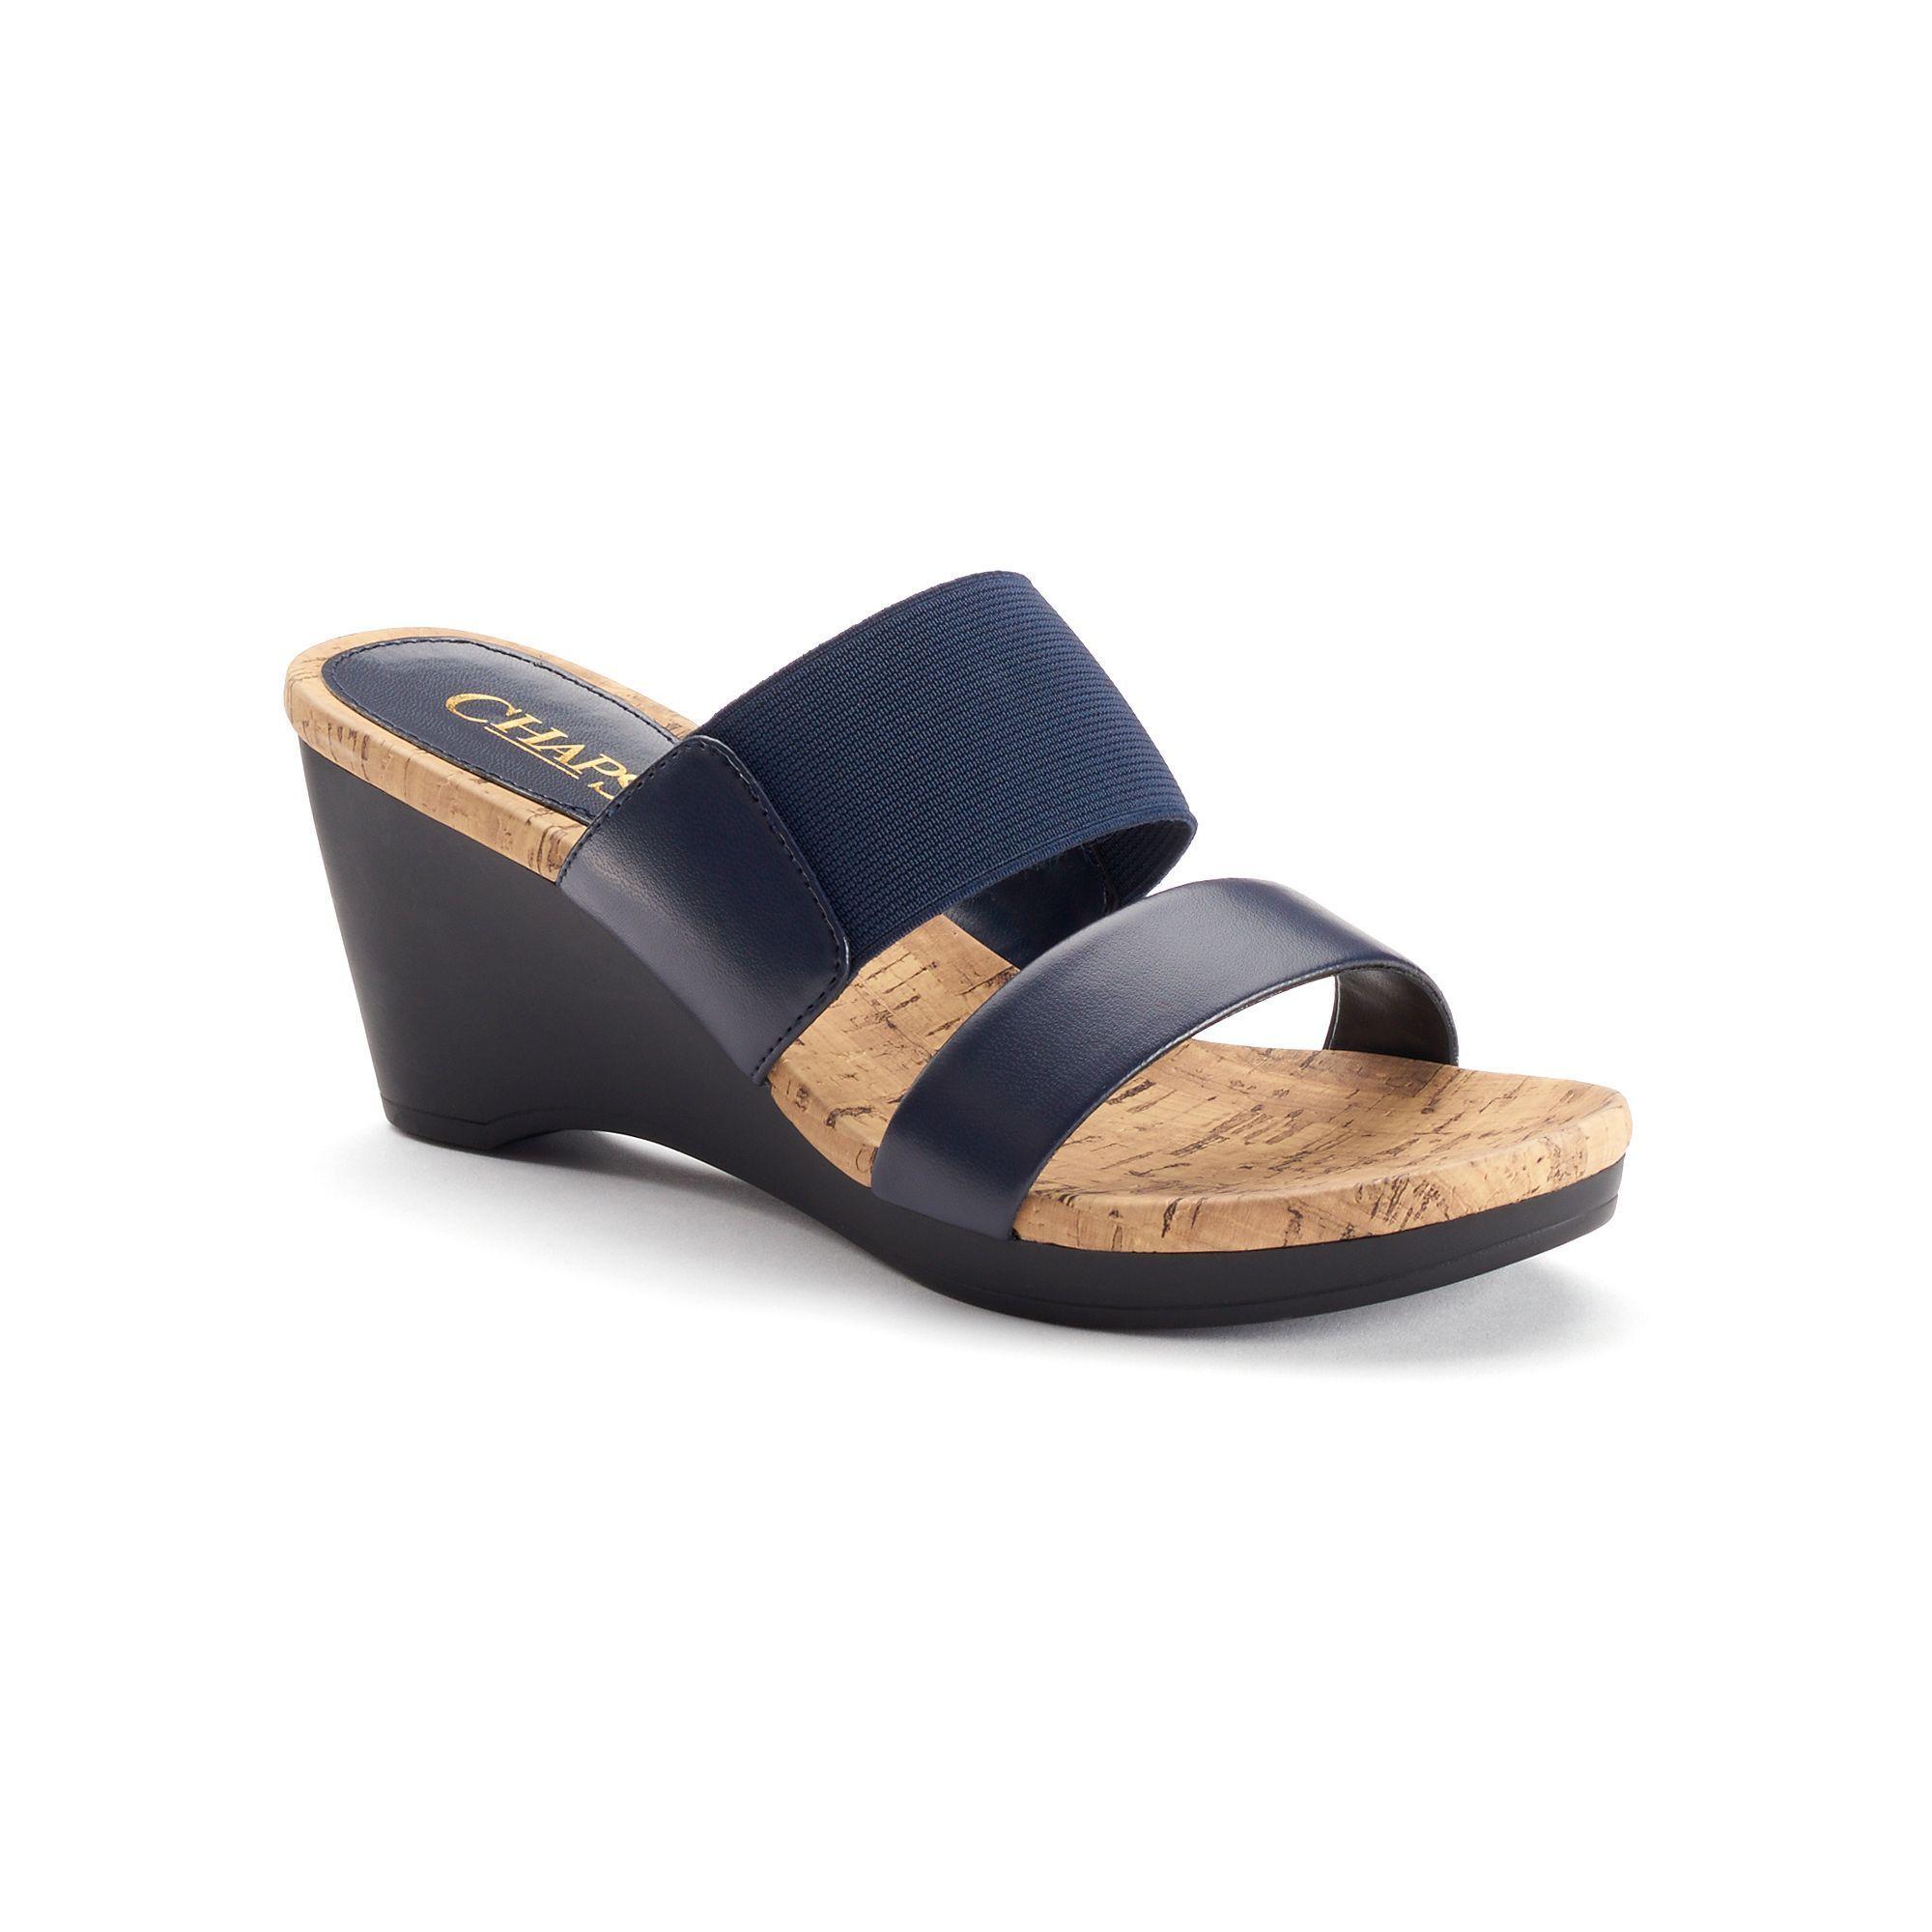 Chaps rhoda women s slip on wedge dress sandals size 11 b blue navy